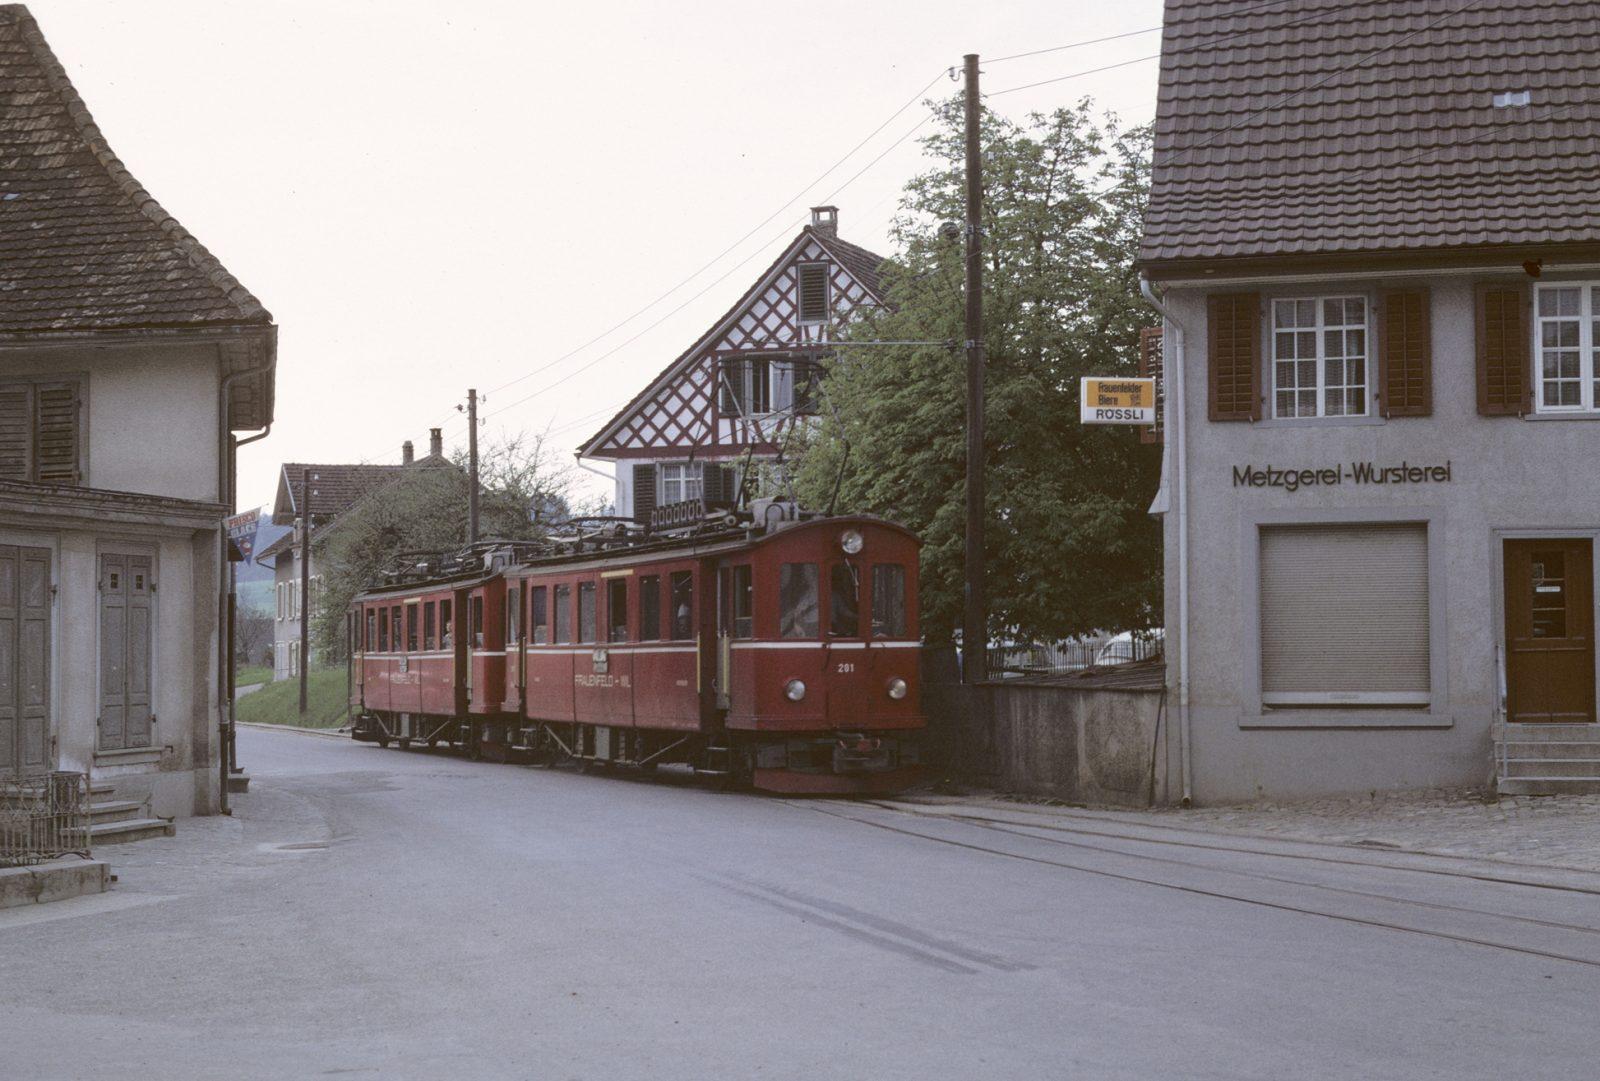 Triebwagen Frauenfeld Wil Bahn